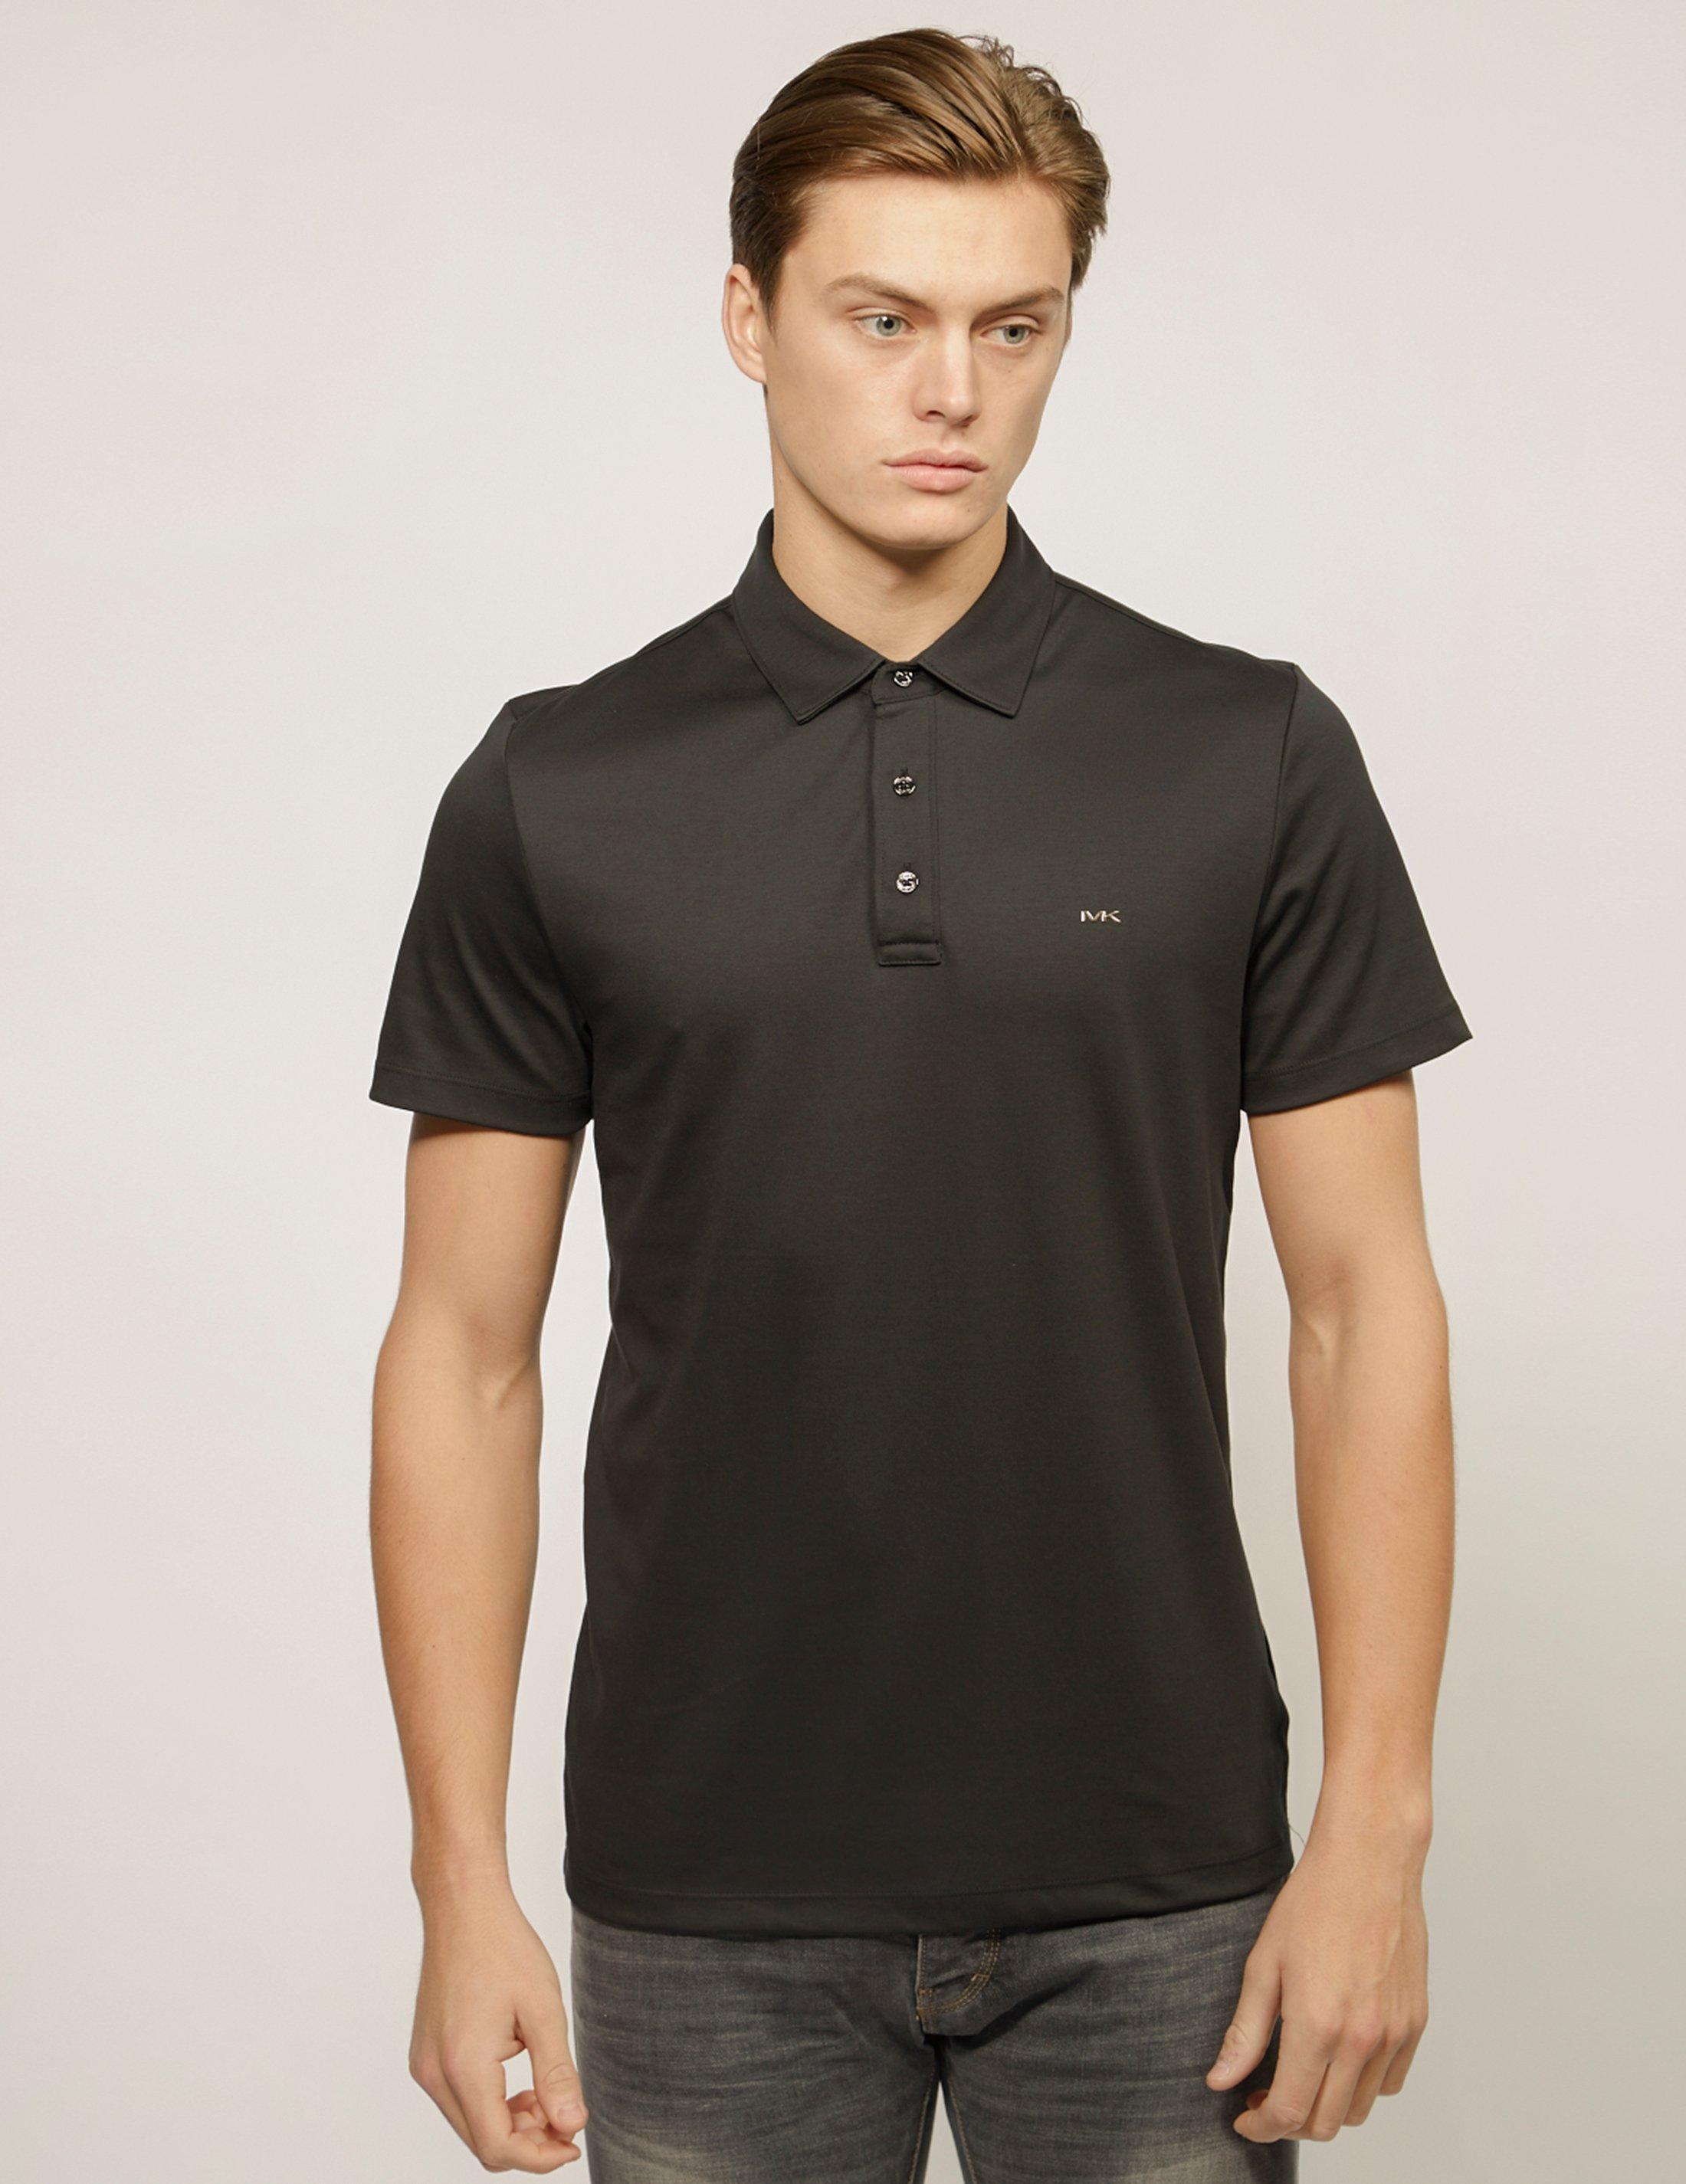 de9305c2b Lyst - Michael Kors Mens Sleek Short Sleeve Polo Shirt Black in ...